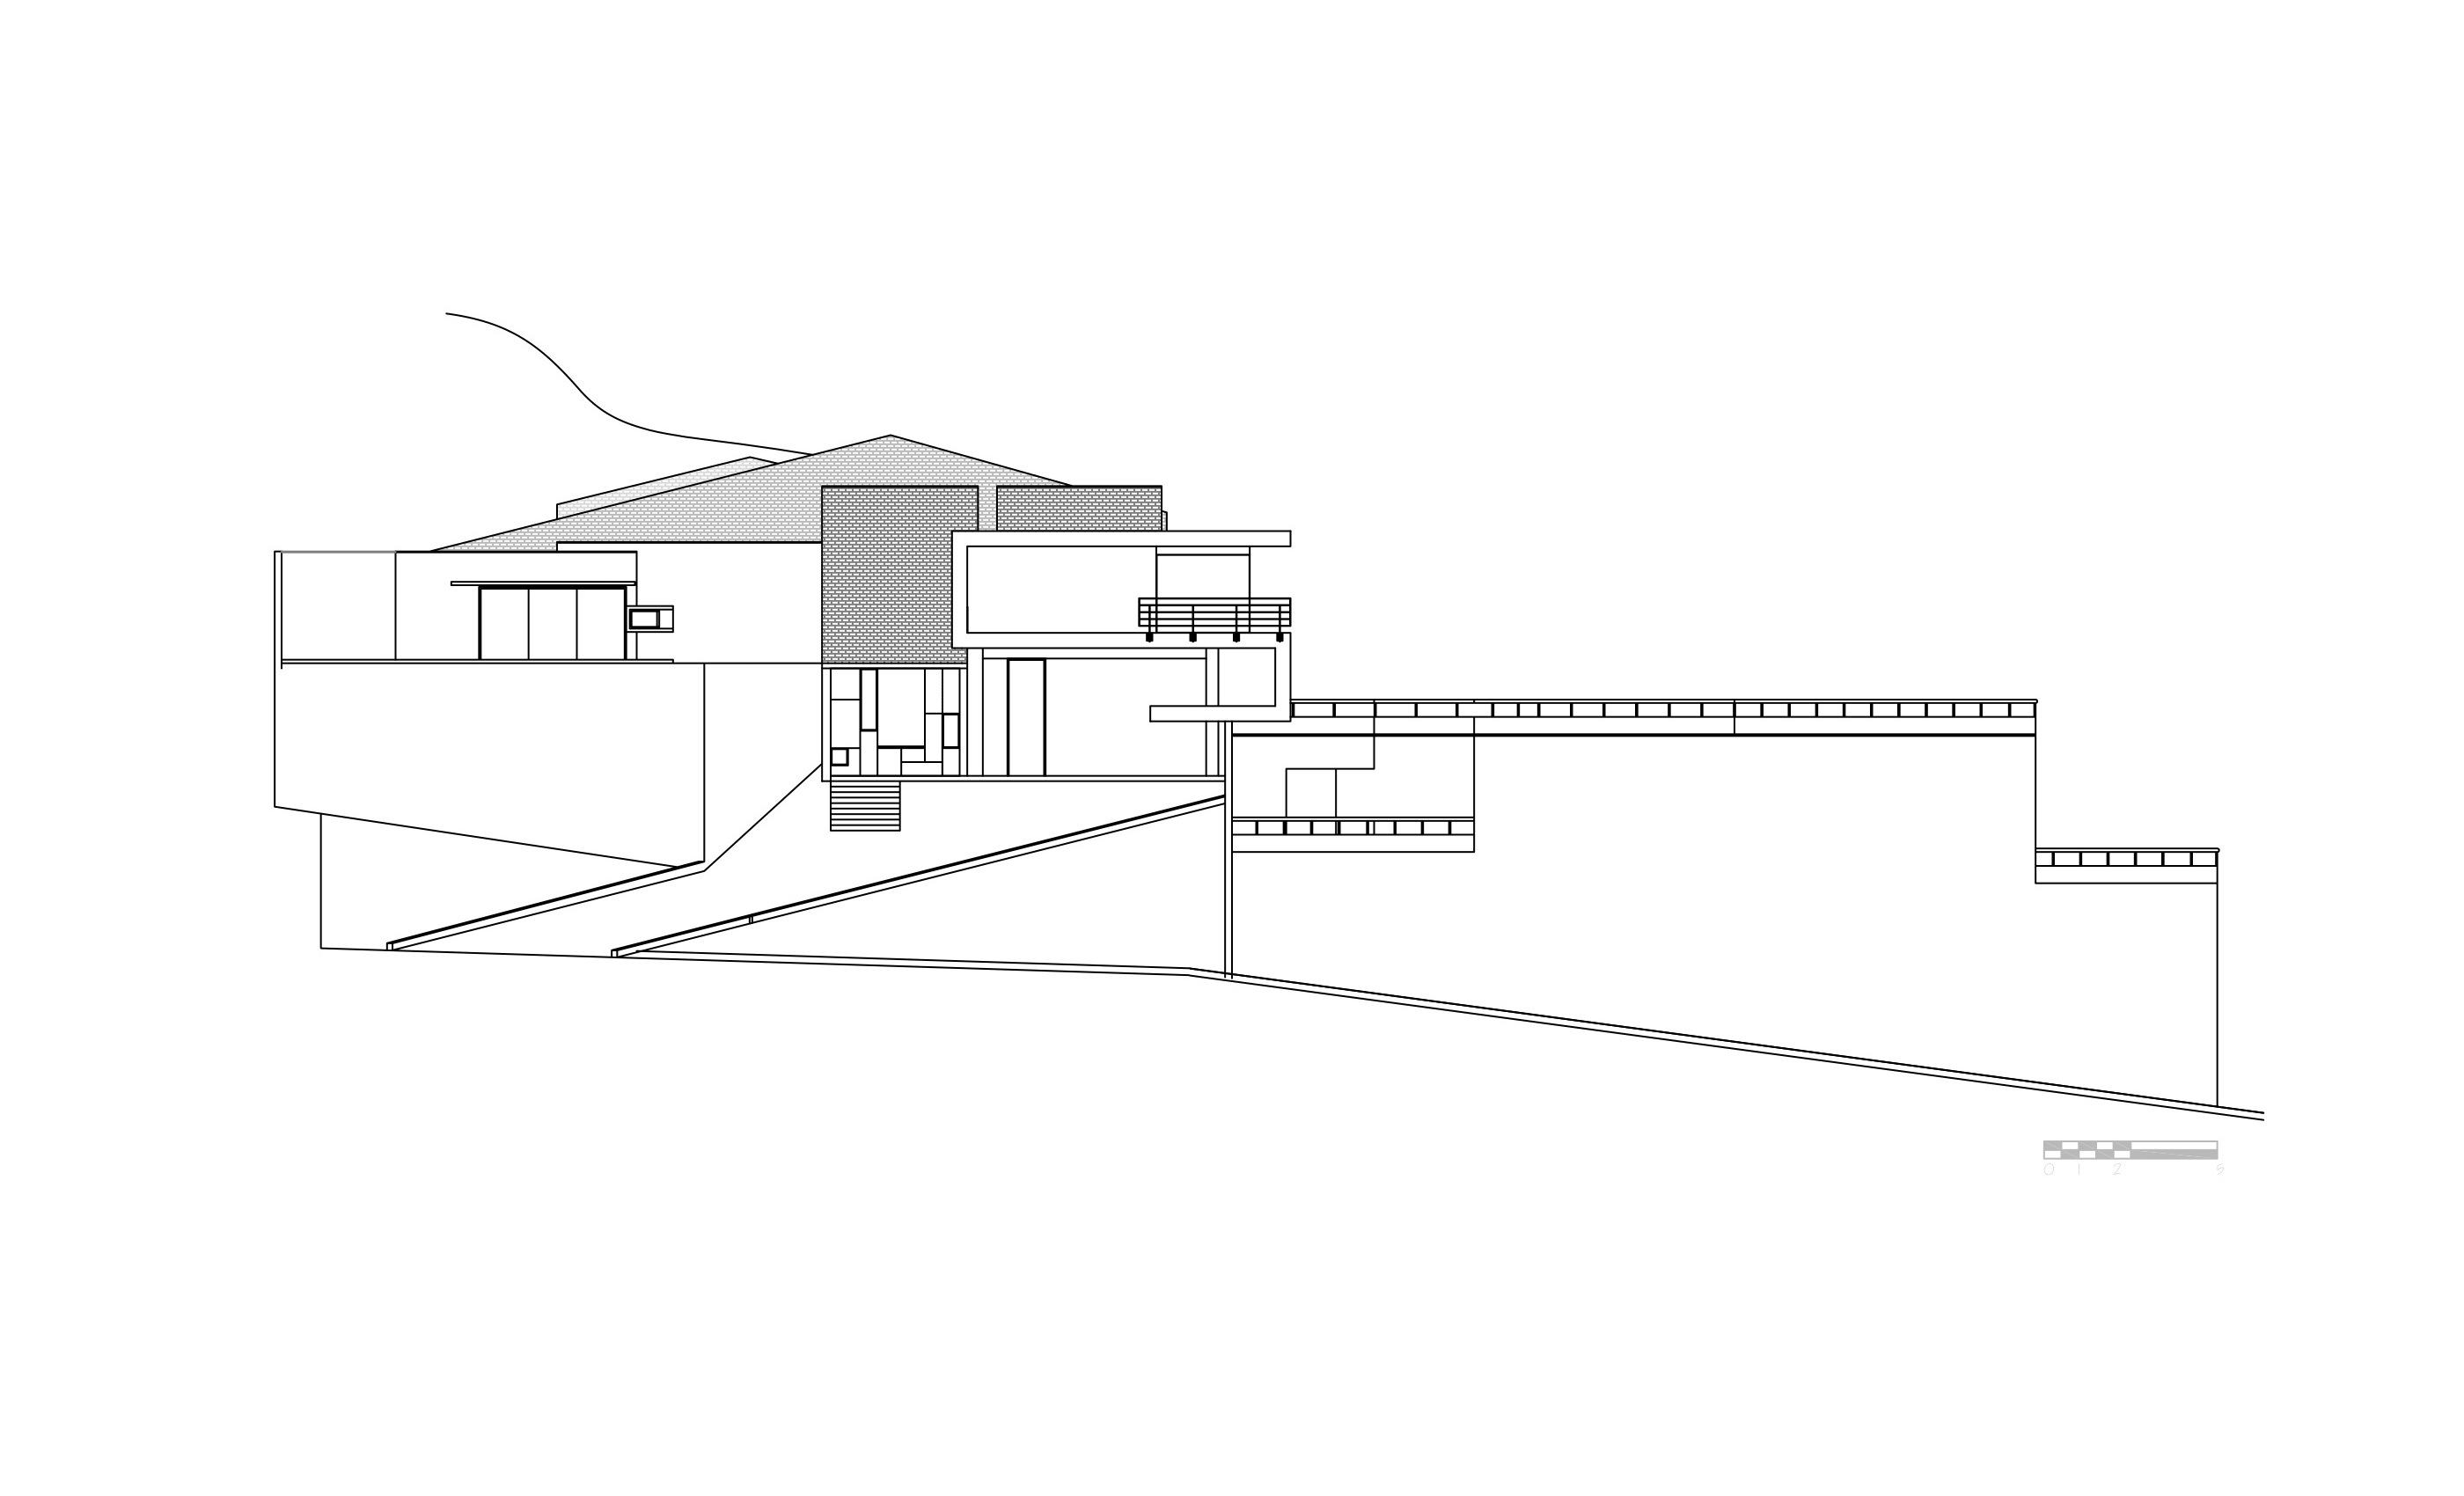 Casa Ensamblaje - Alejandro Borges González, Arquitectura, diseño